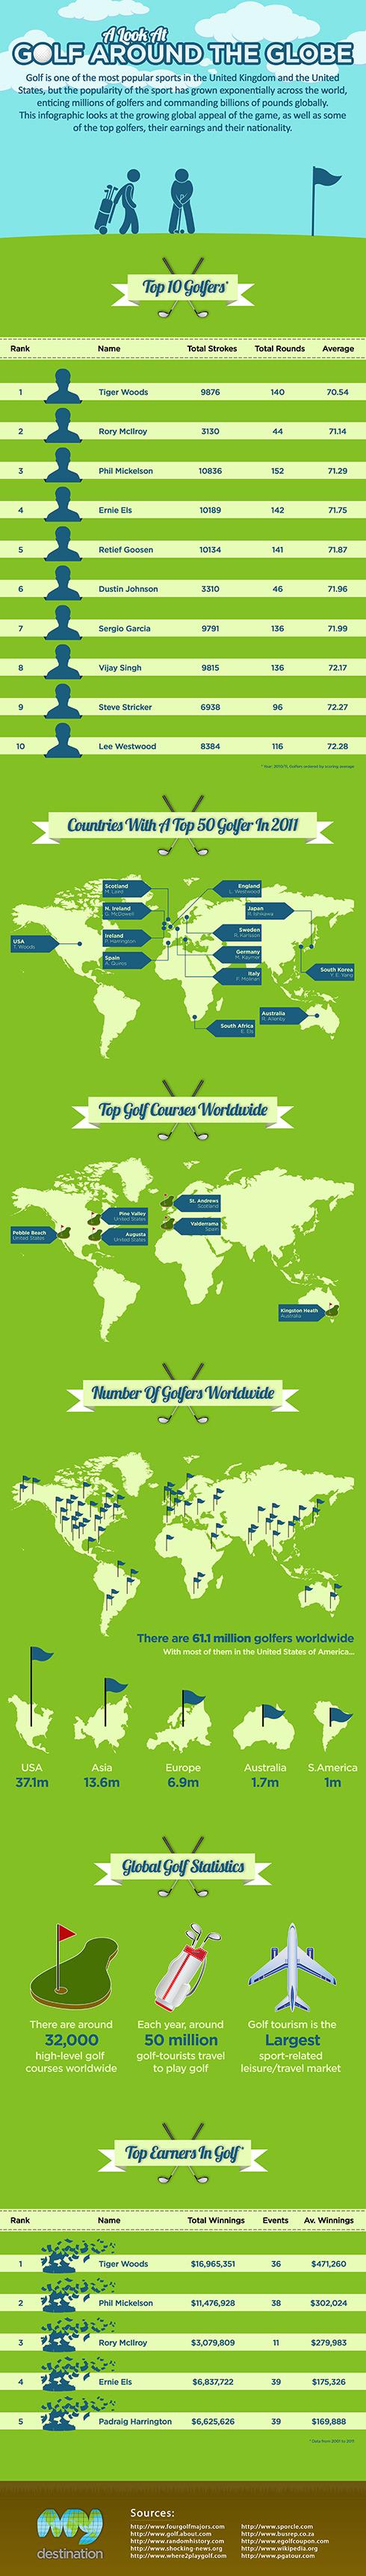 Top Golfers Around the World and Statistics